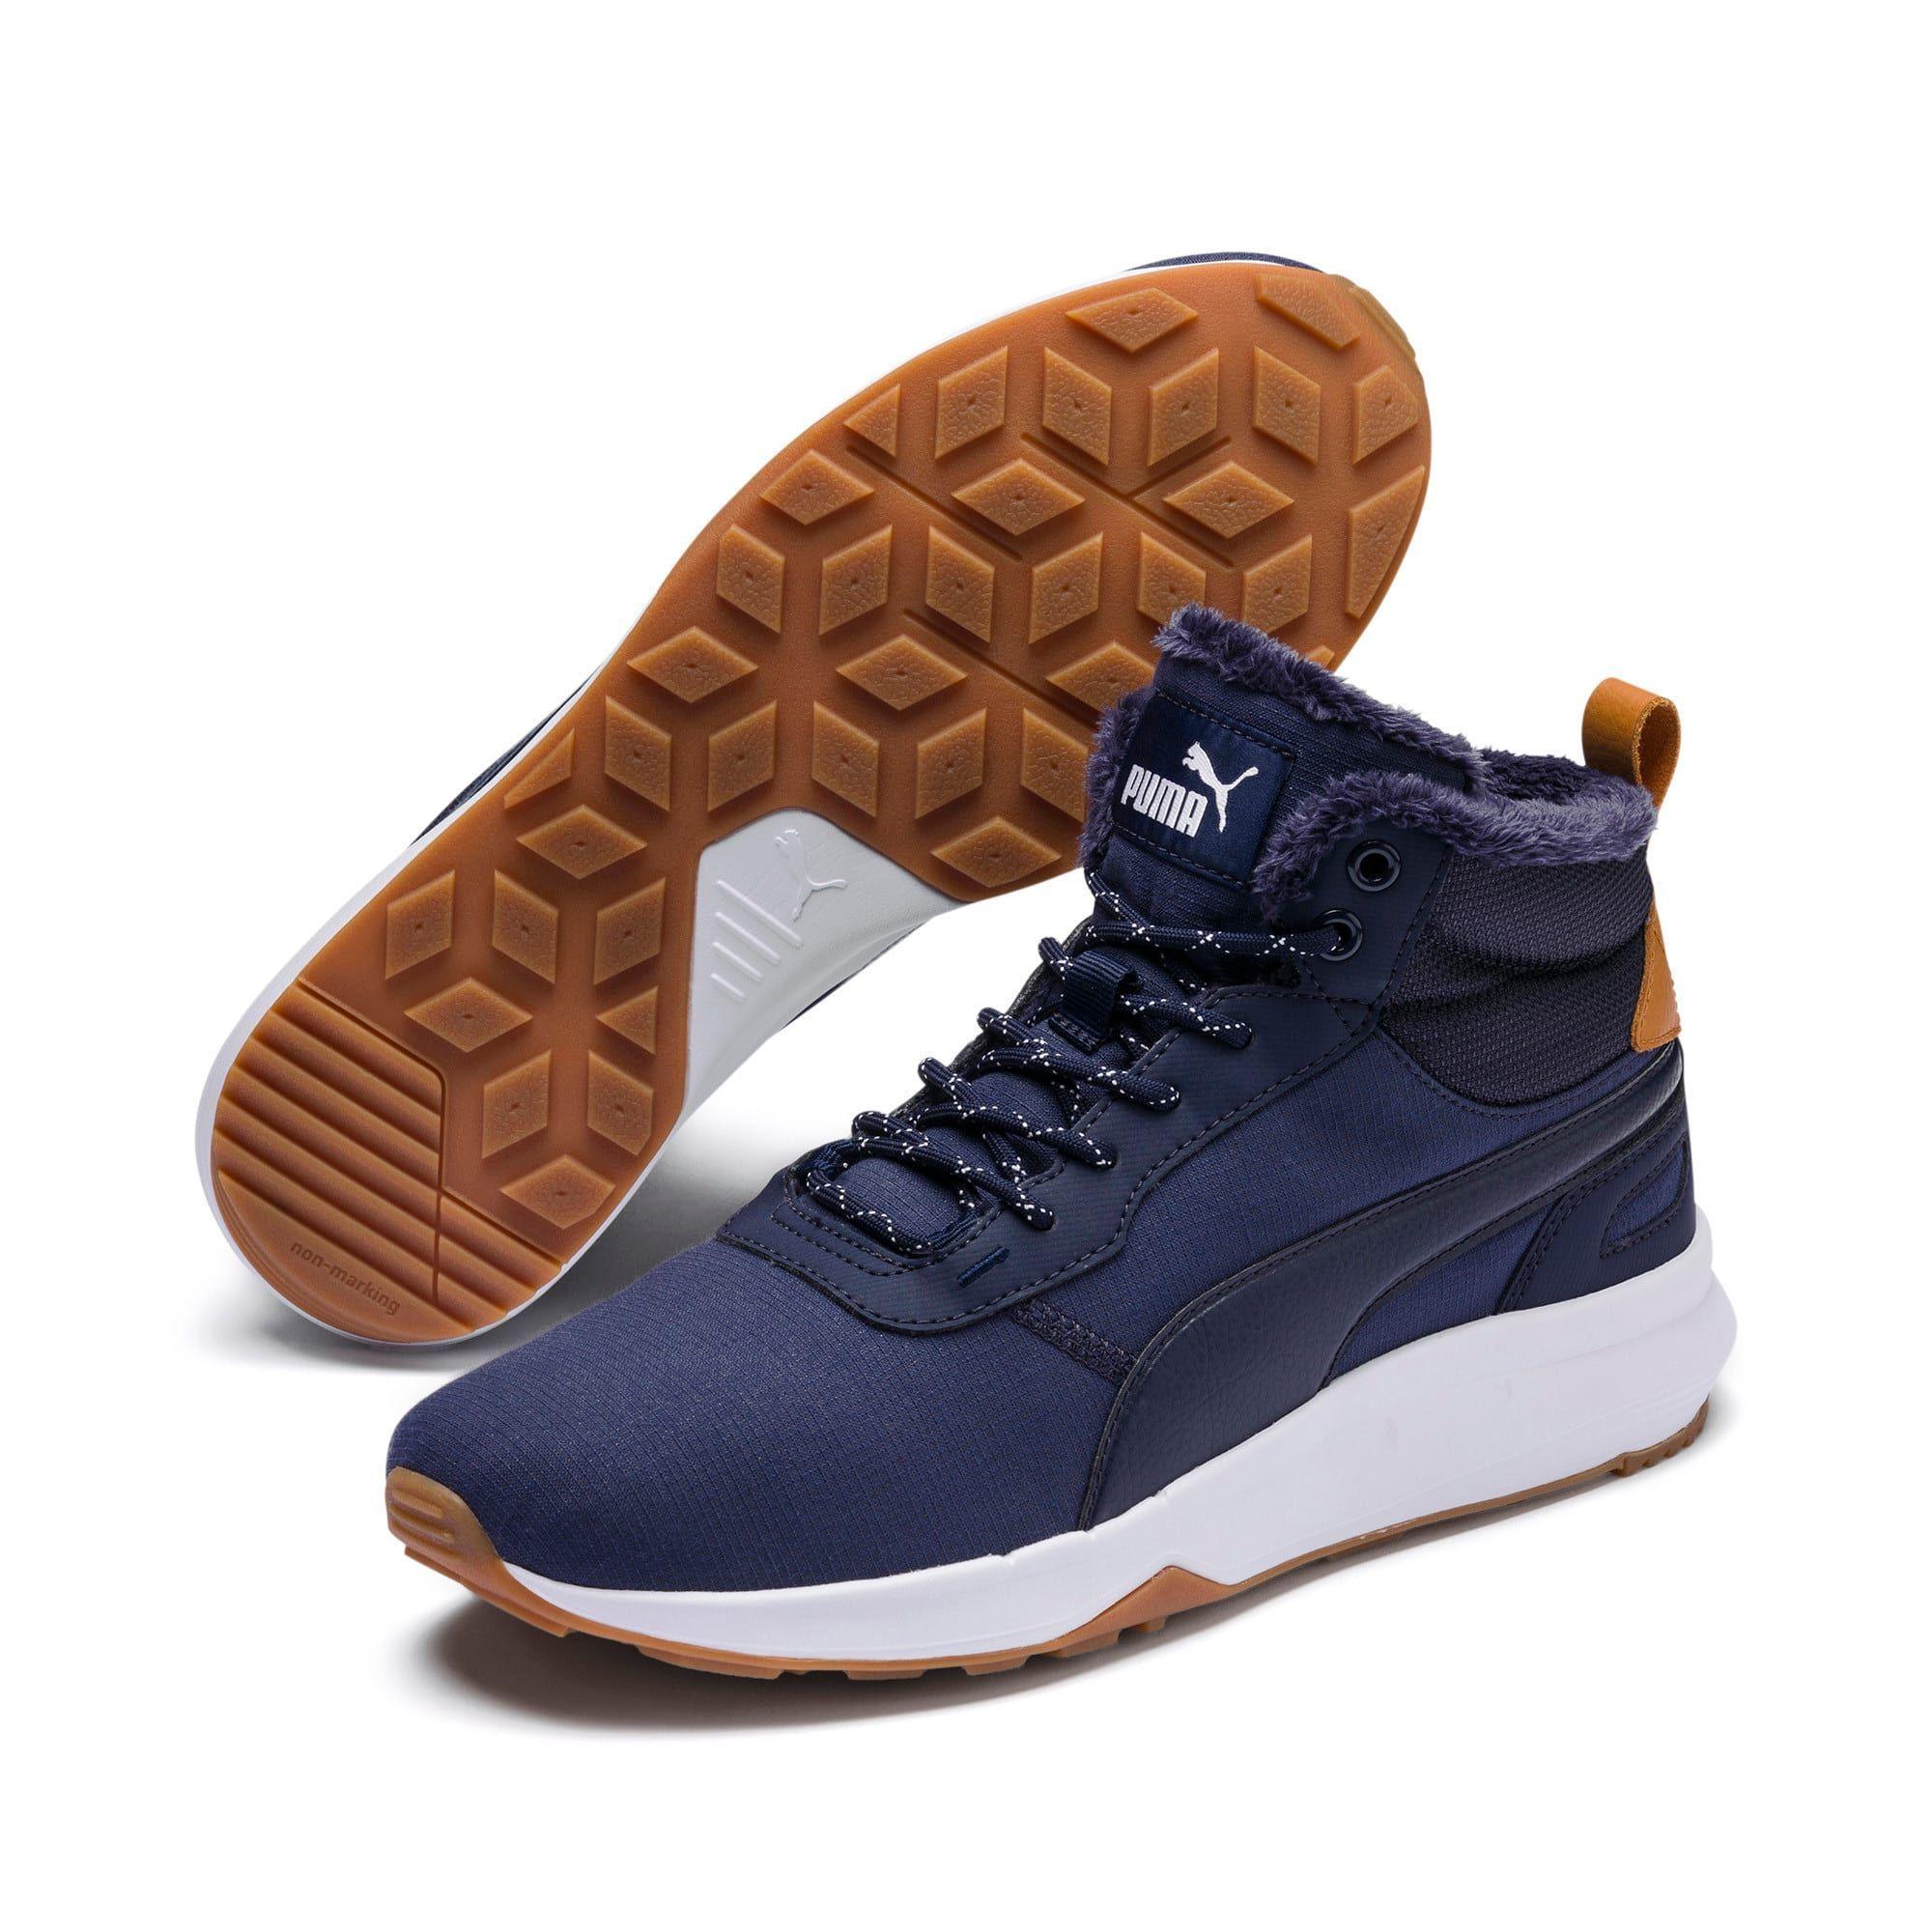 Puma Activate Mid Cut Peacoat Boots Grosse 9 Activate Boots Peacoat In 2020 Schuhe Fur Den Winter Gefutterte Stiefel Kinder Schuhe